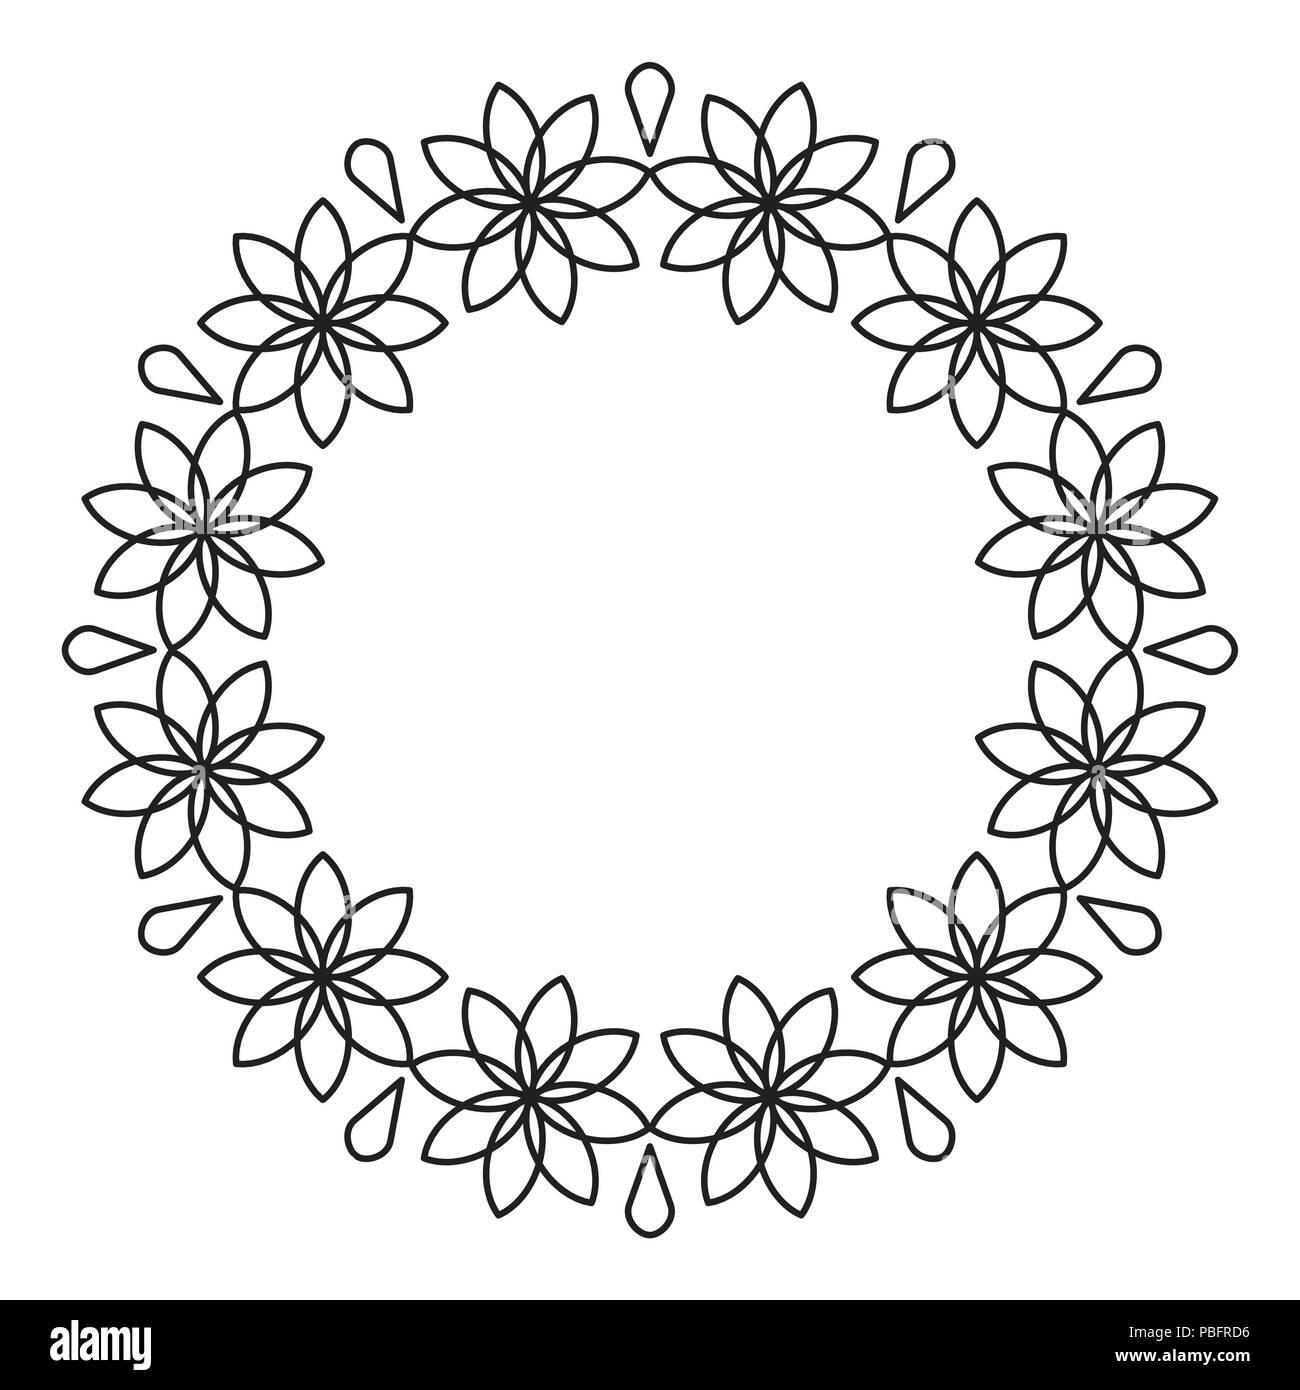 Outline flowers circle frame design, monochrome, floral